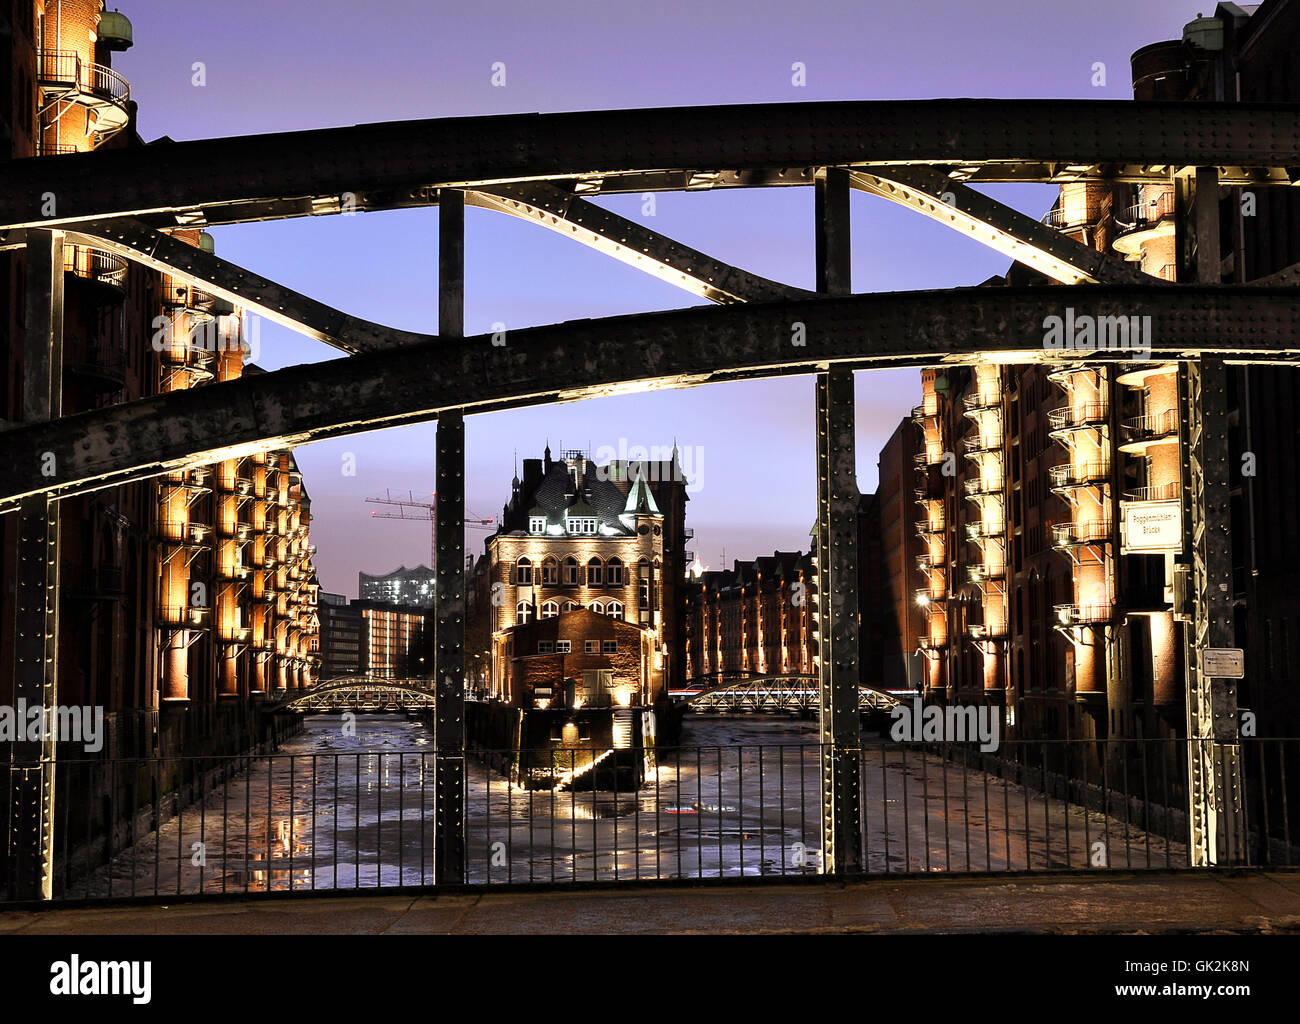 hamburg memory city historical - Stock Image